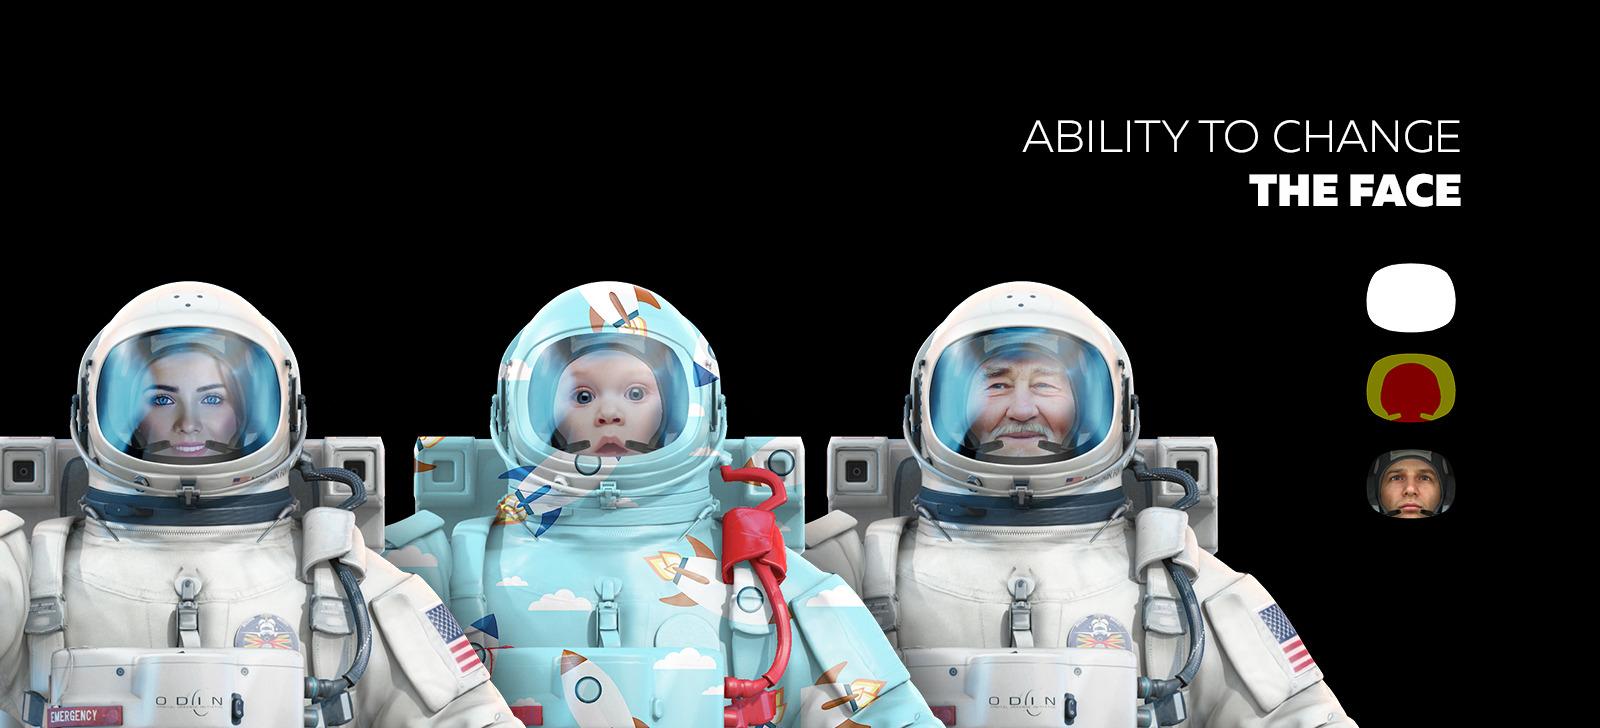 3D Mockup Space Astronaut #10